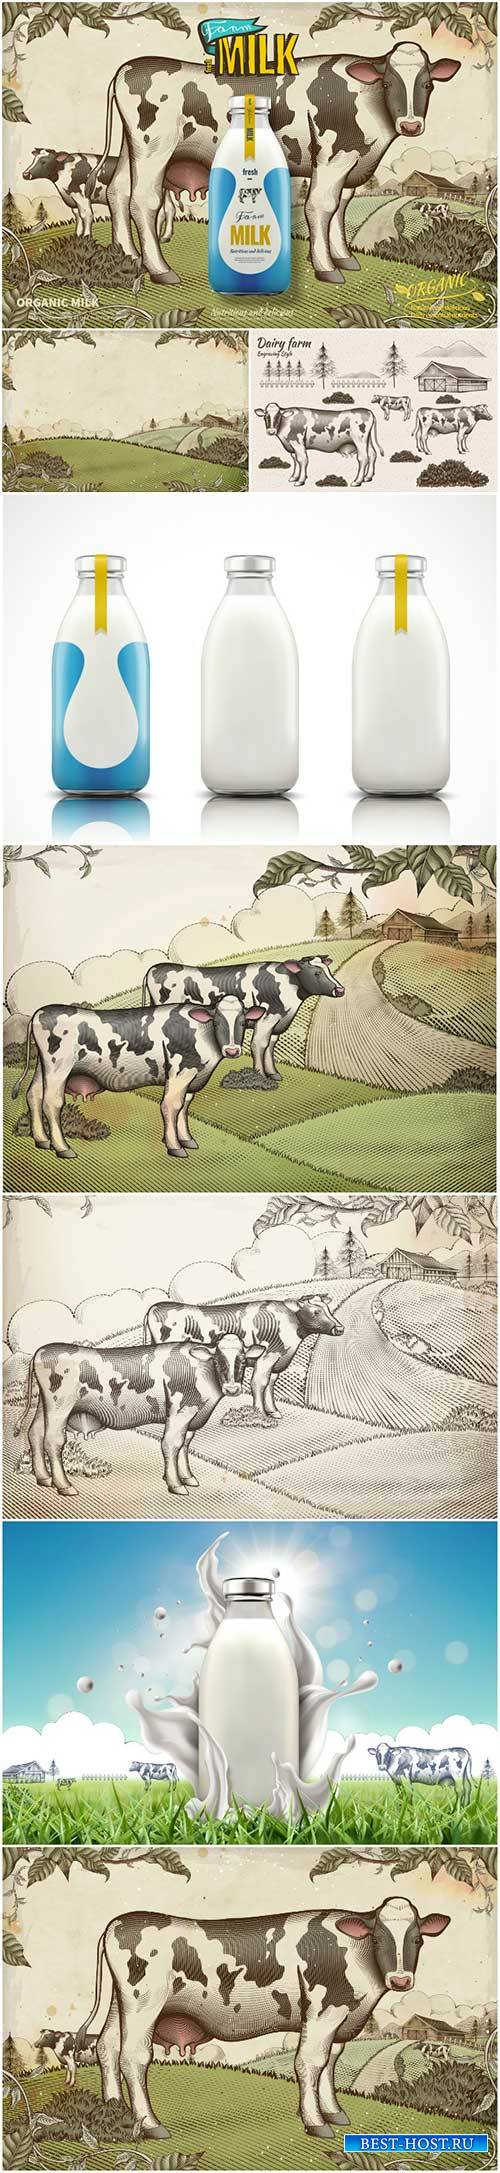 Farm fresh milk in 3d illustration on retro engraved farmland and dairy cat ...